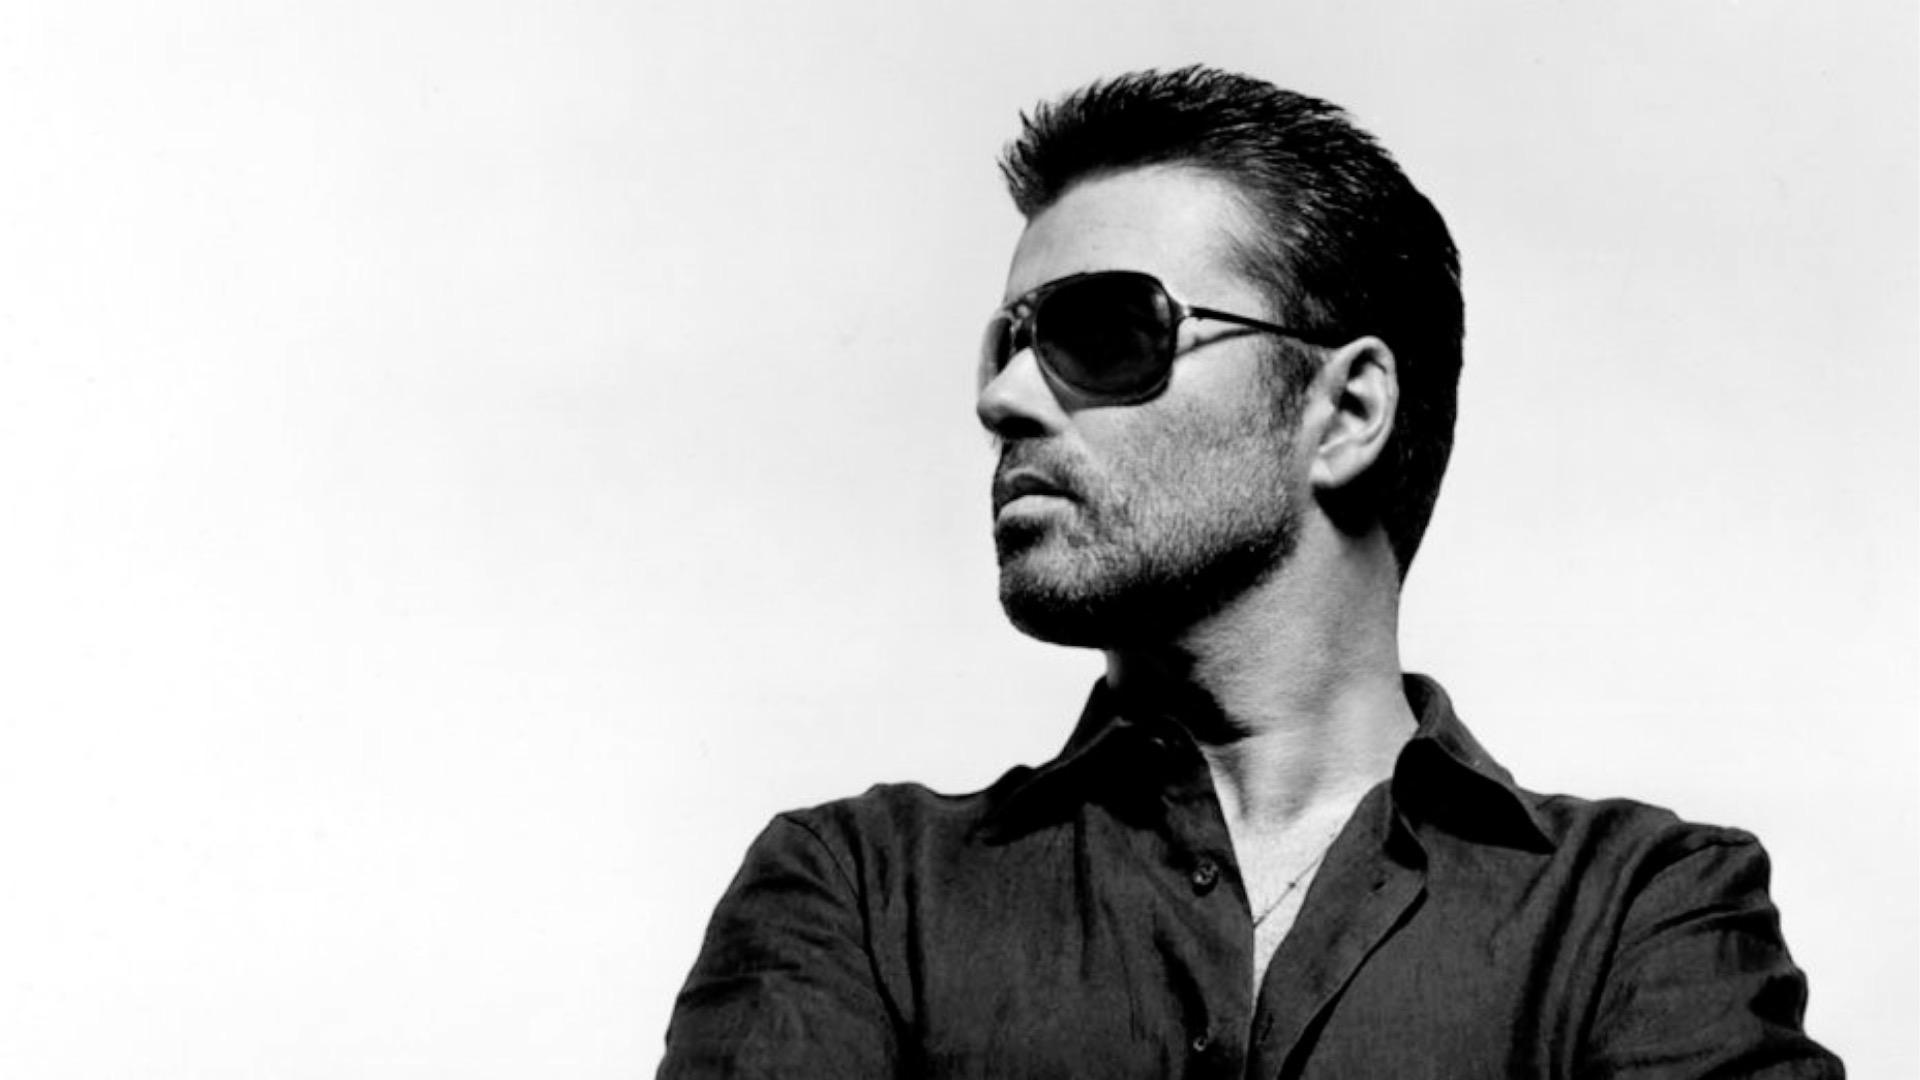 Top 5 George Michael Tracks